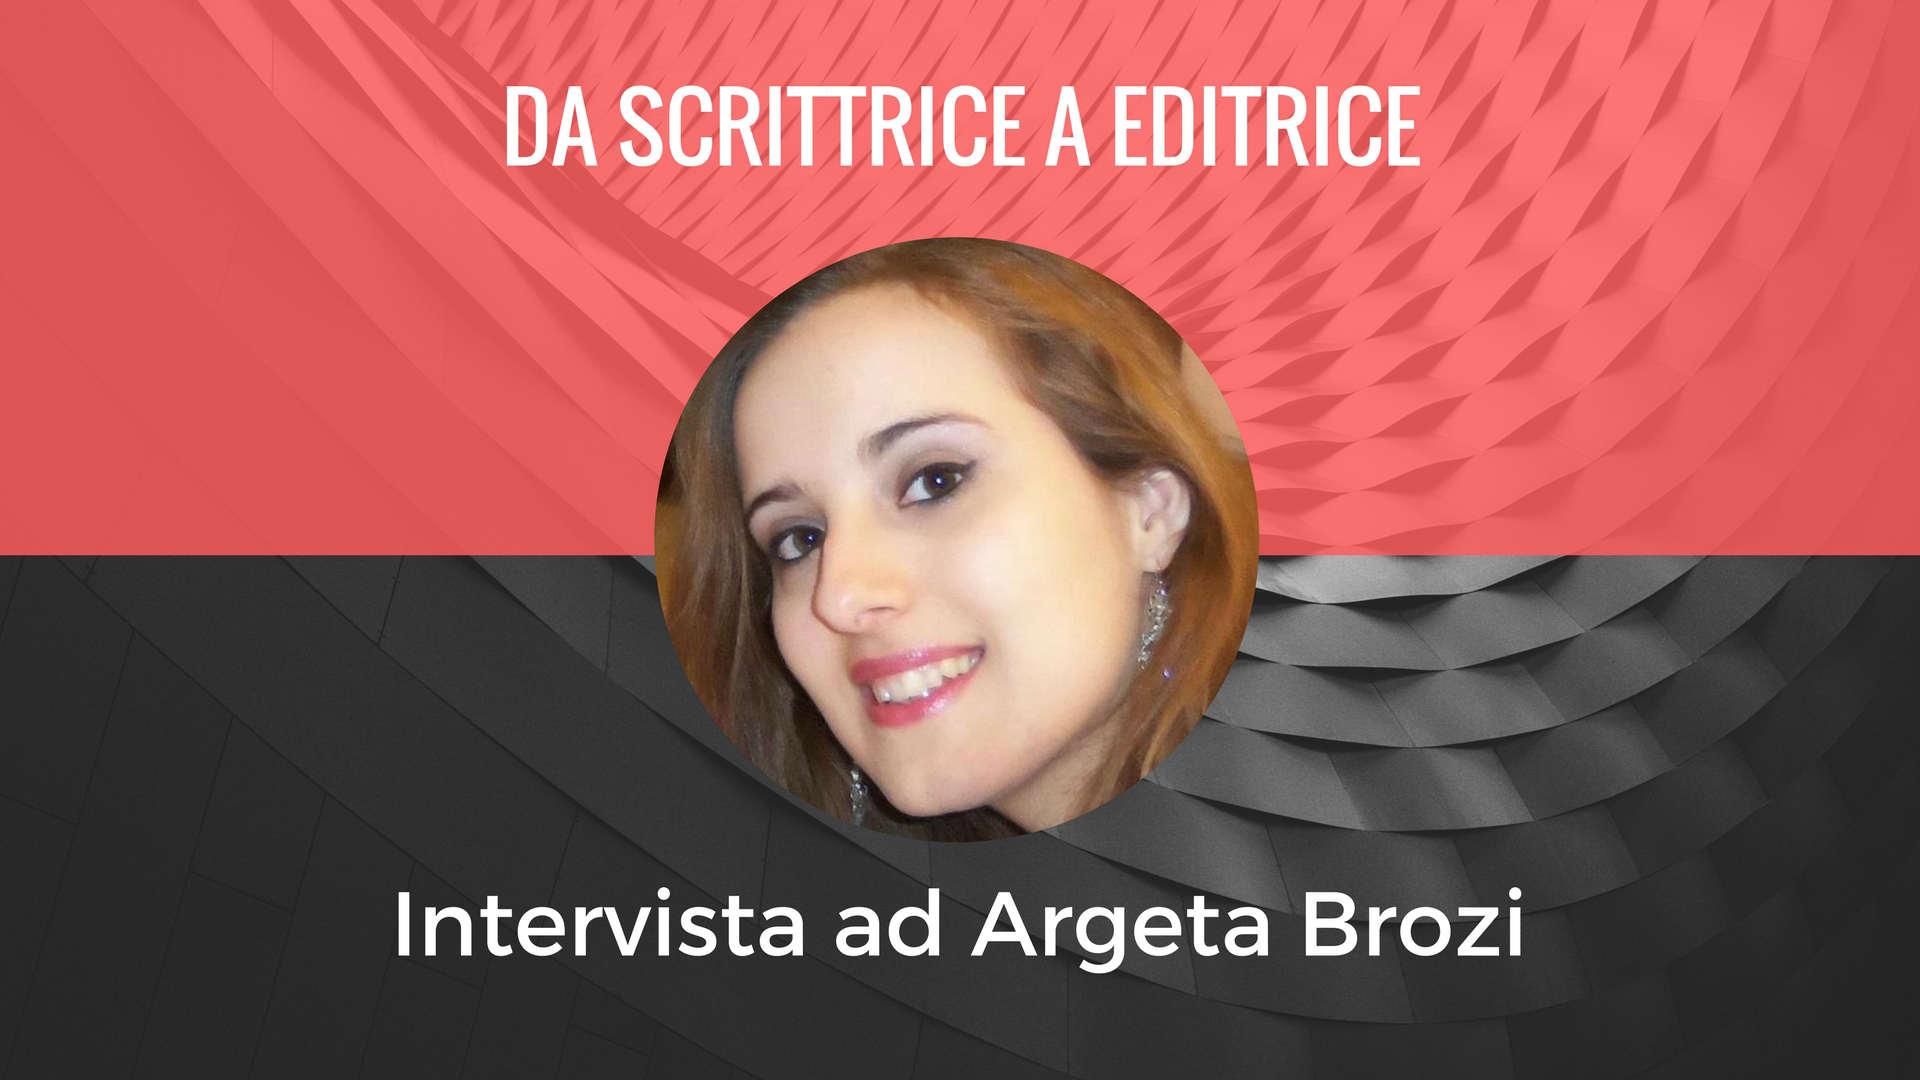 Intervista ad Argeta Brozi